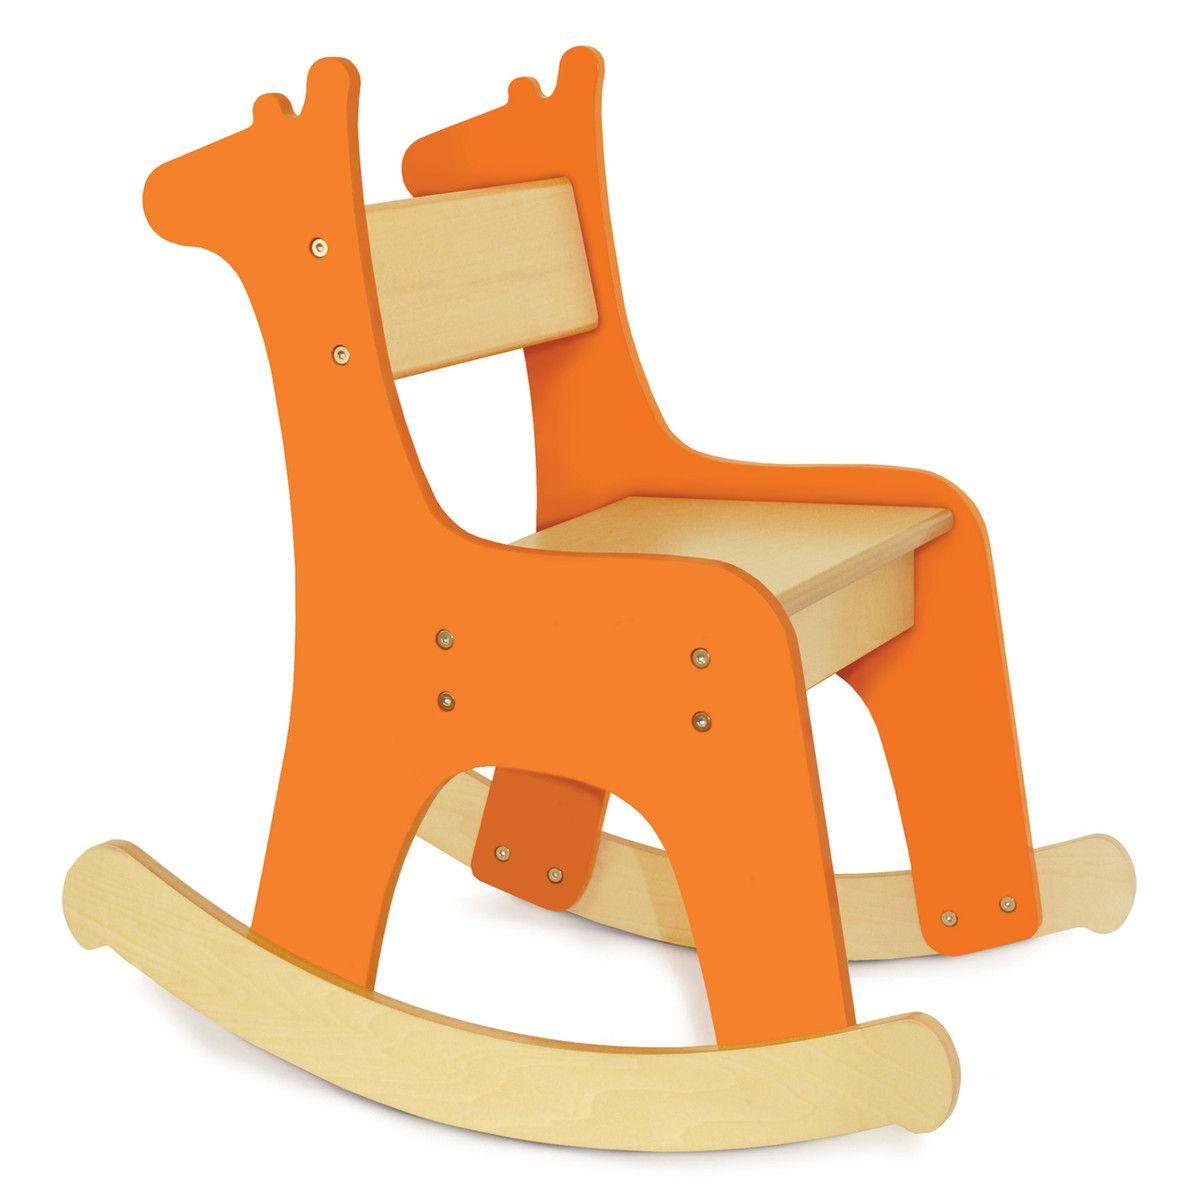 Giraffe Rocking Chair Brookstone Full Body Massage Thinking About Steph And